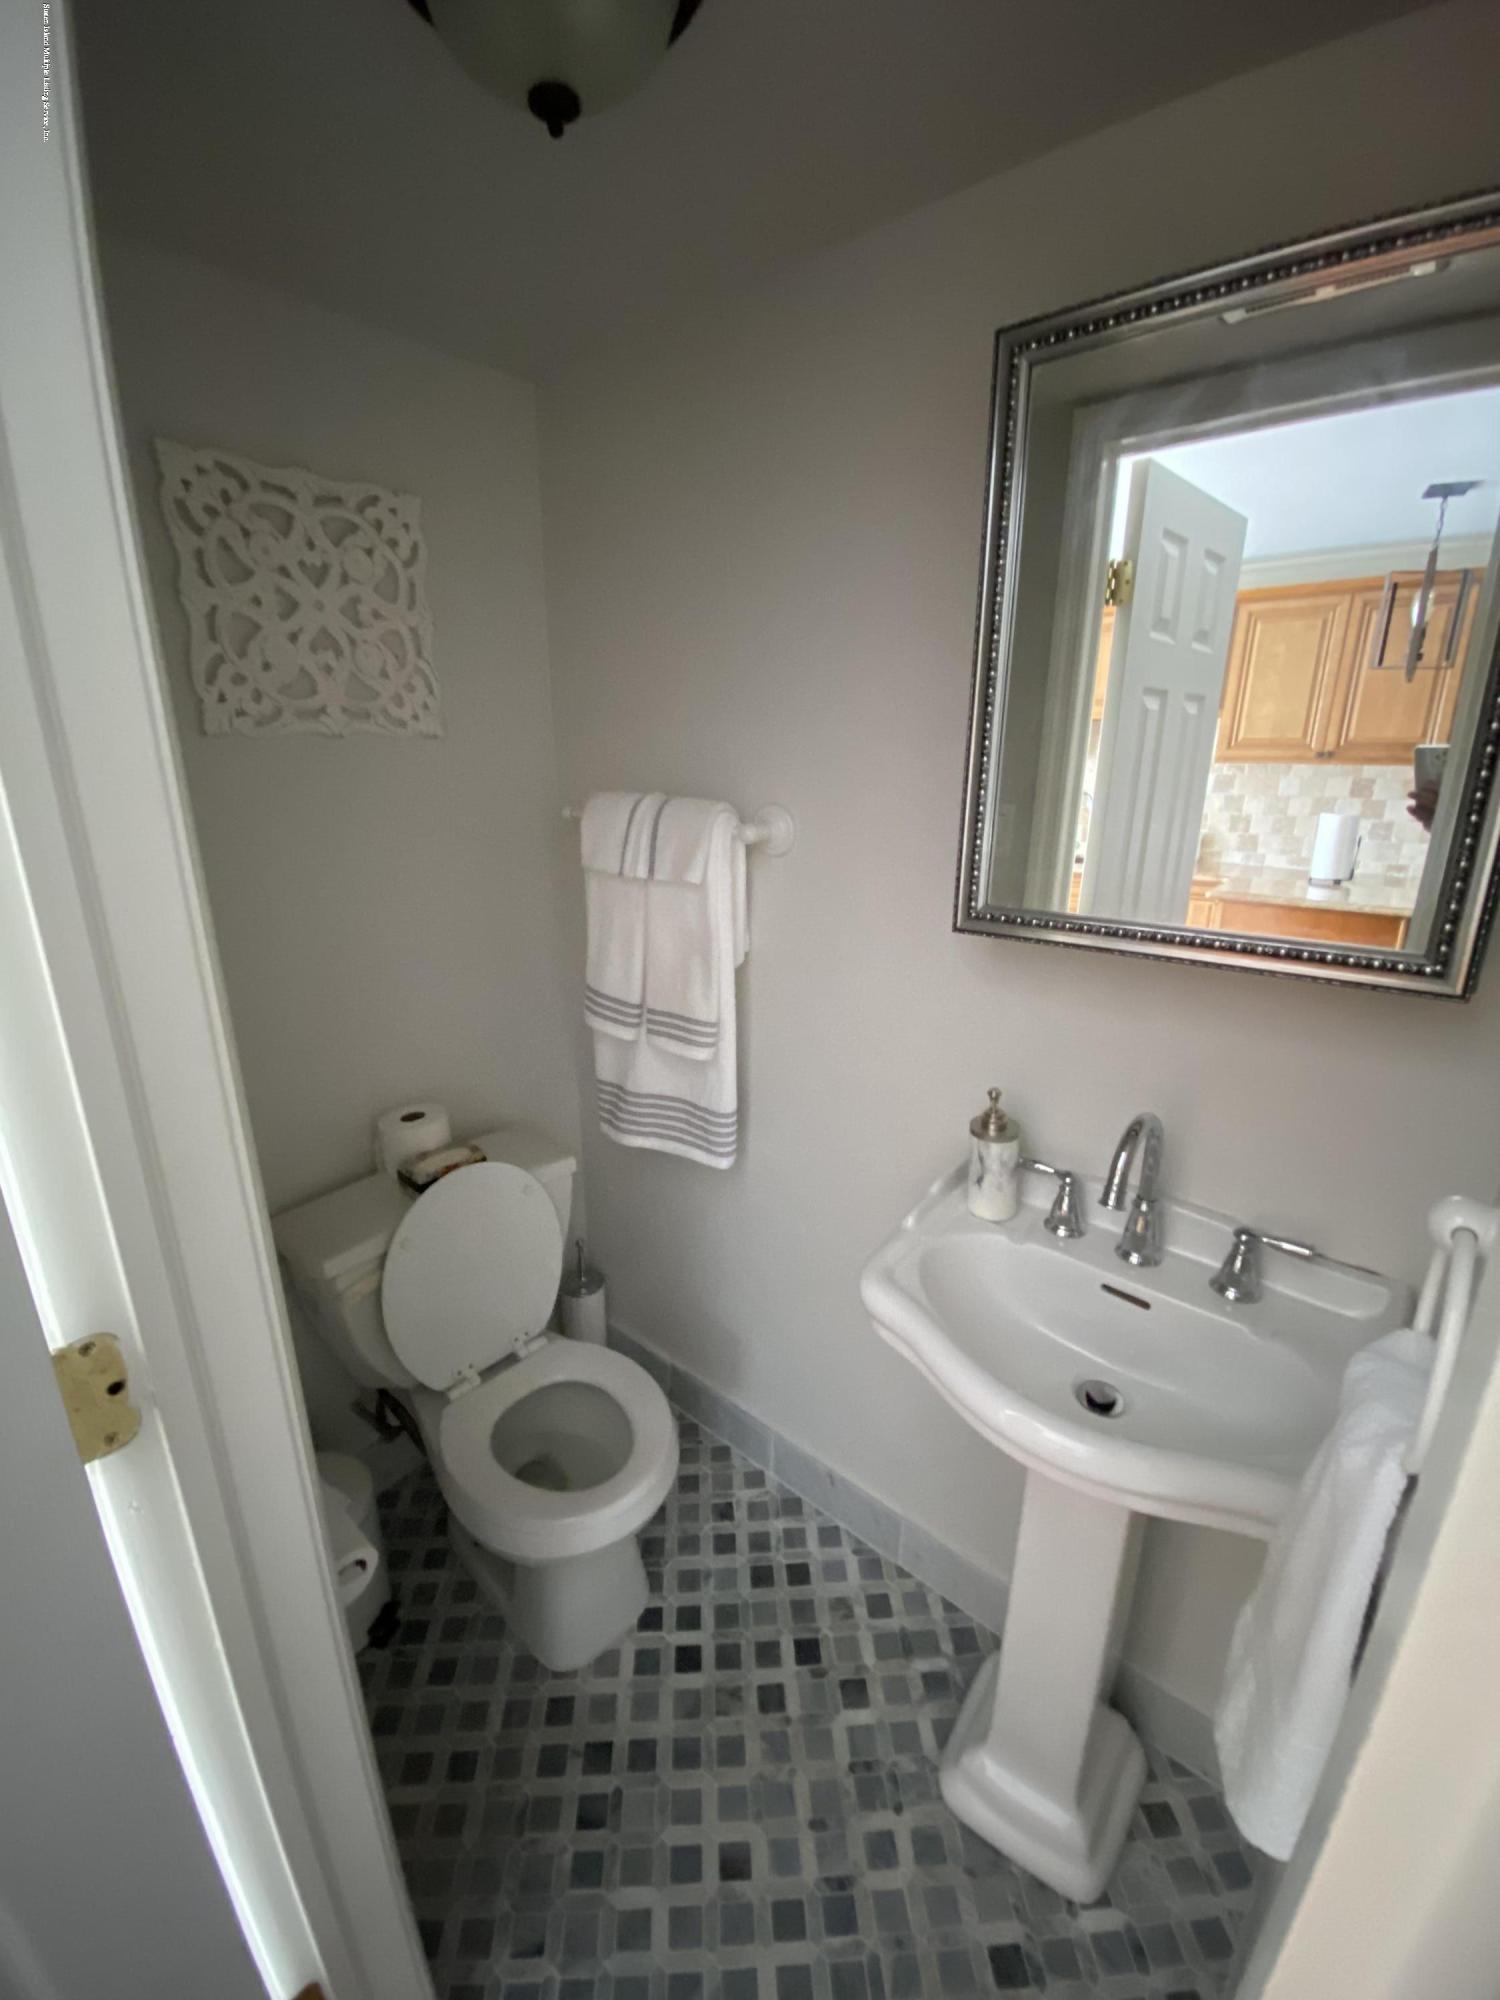 Single Family - Semi-Attached 370 Seaver Avenue  Staten Island, NY 10305, MLS-1136339-9